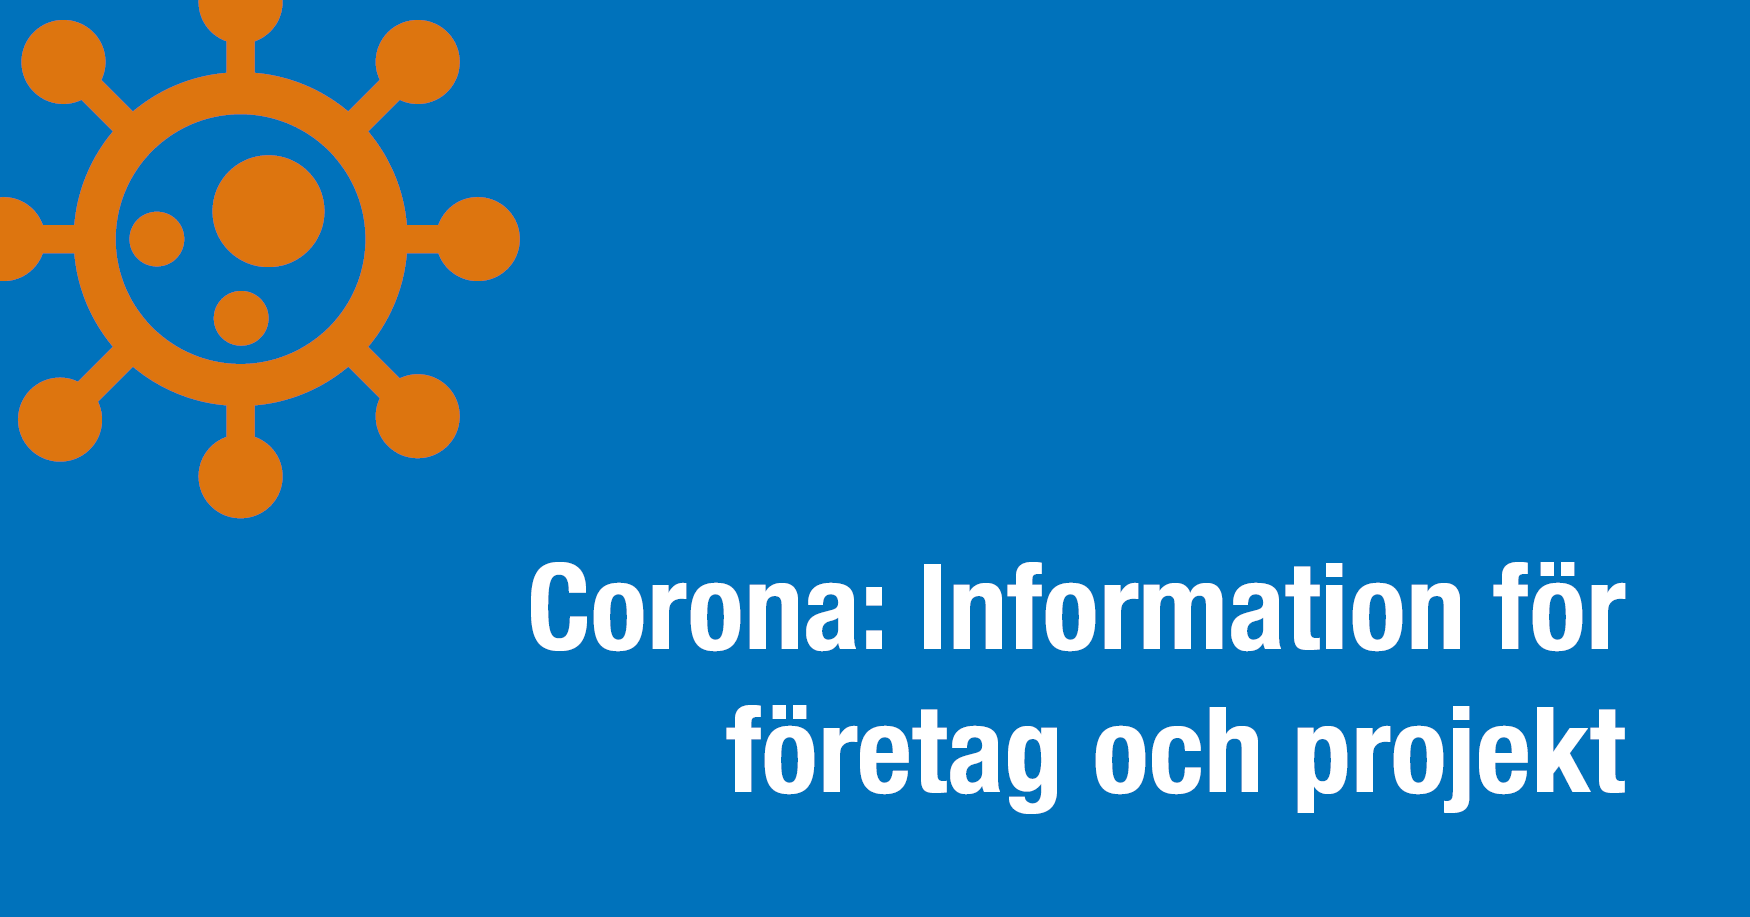 Bjrsbyvgen 424 Norrbottens ln, Lule - satisfaction-survey.net